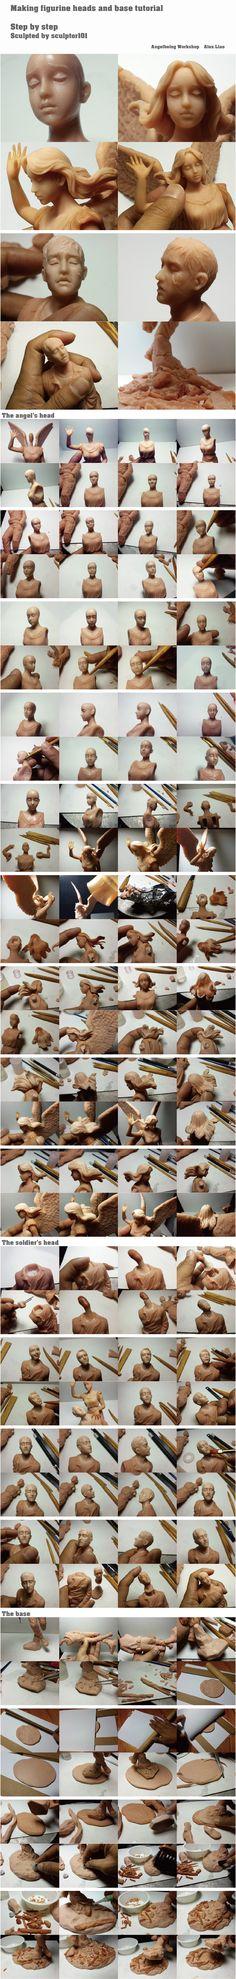 Figurine WIP tutorial part 6 heads + base final by sculptor101 on DeviantArt